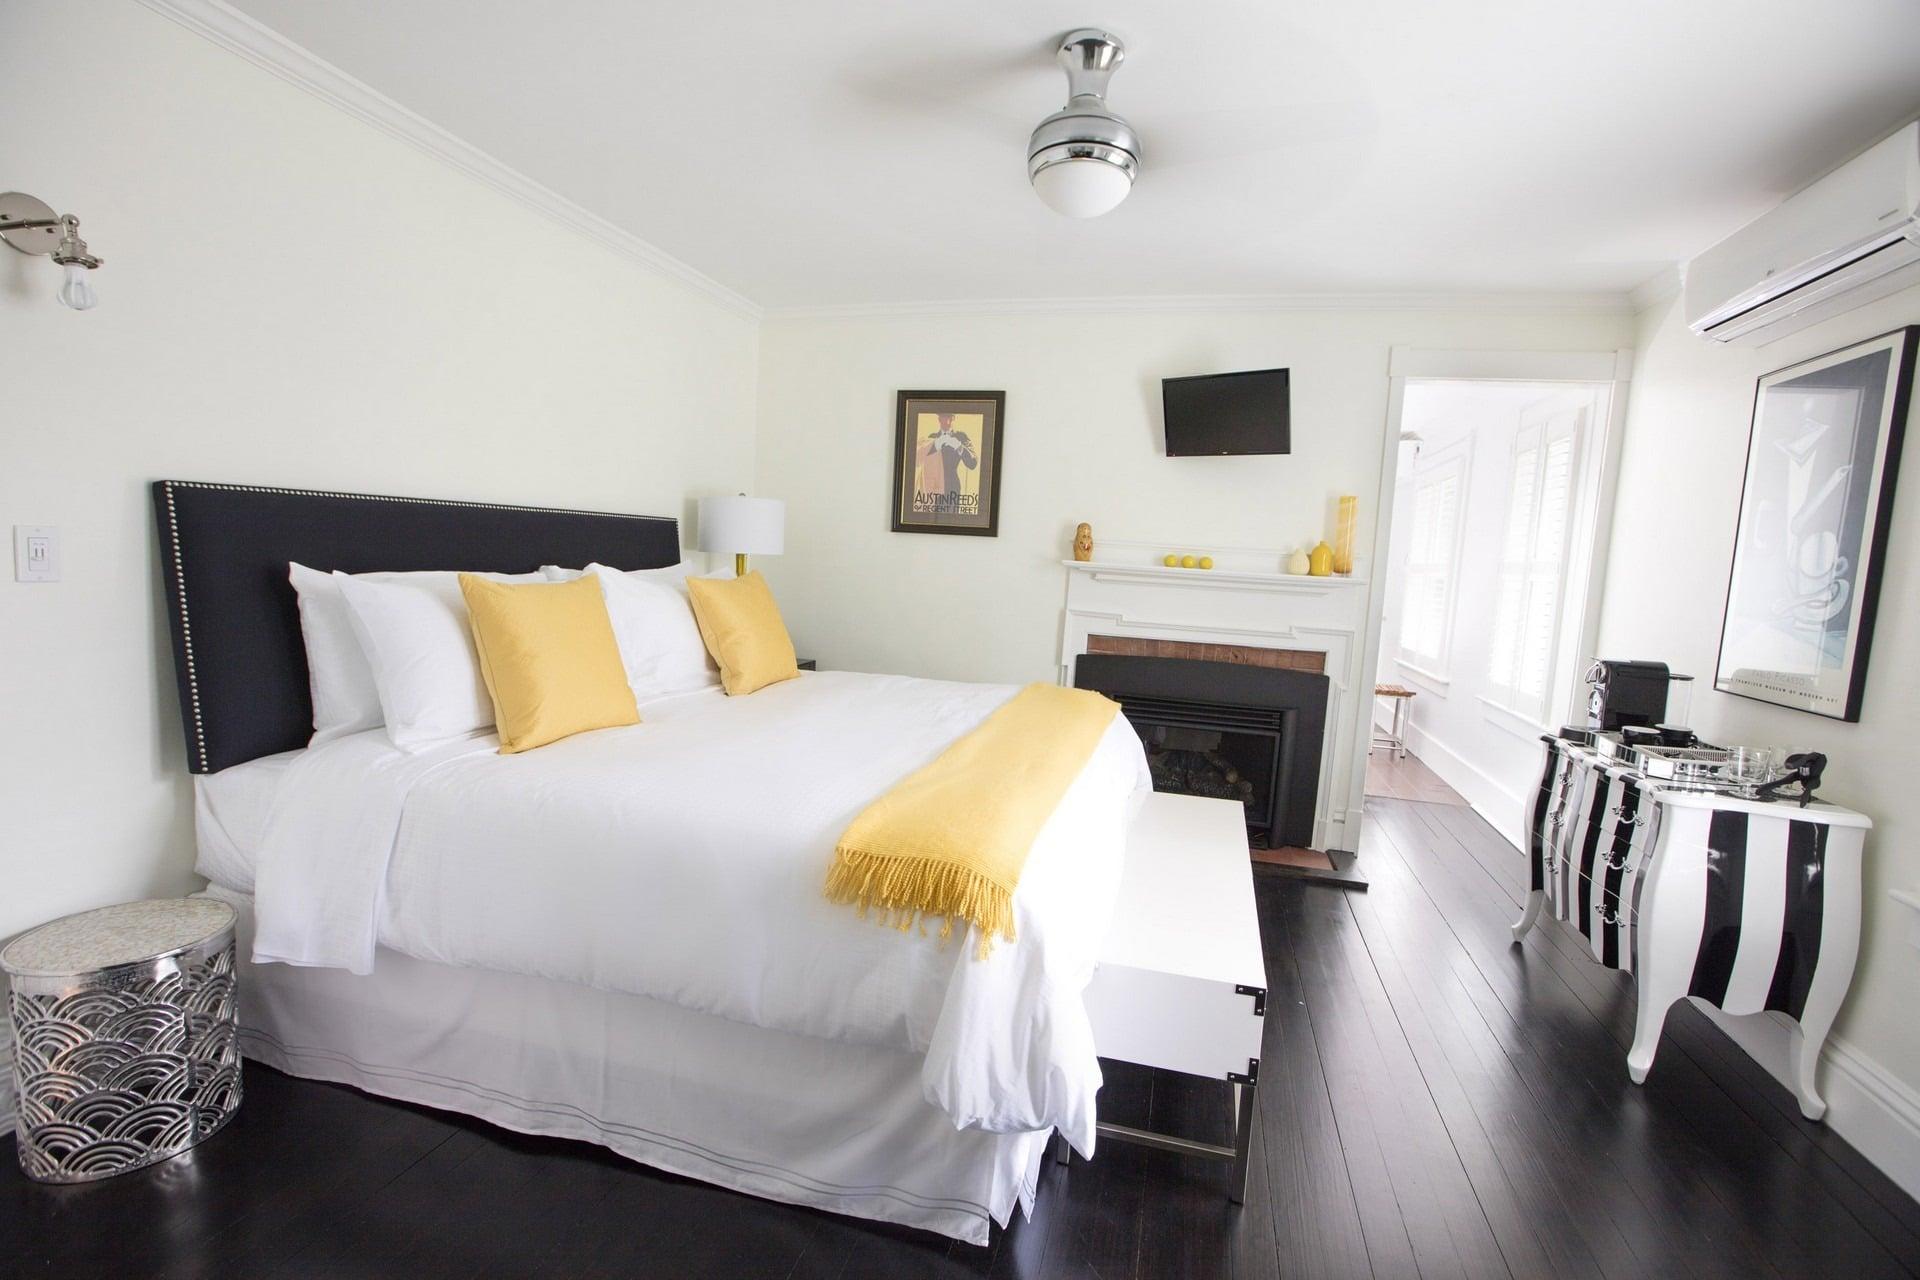 Nobnocket-Bedroom Room 2